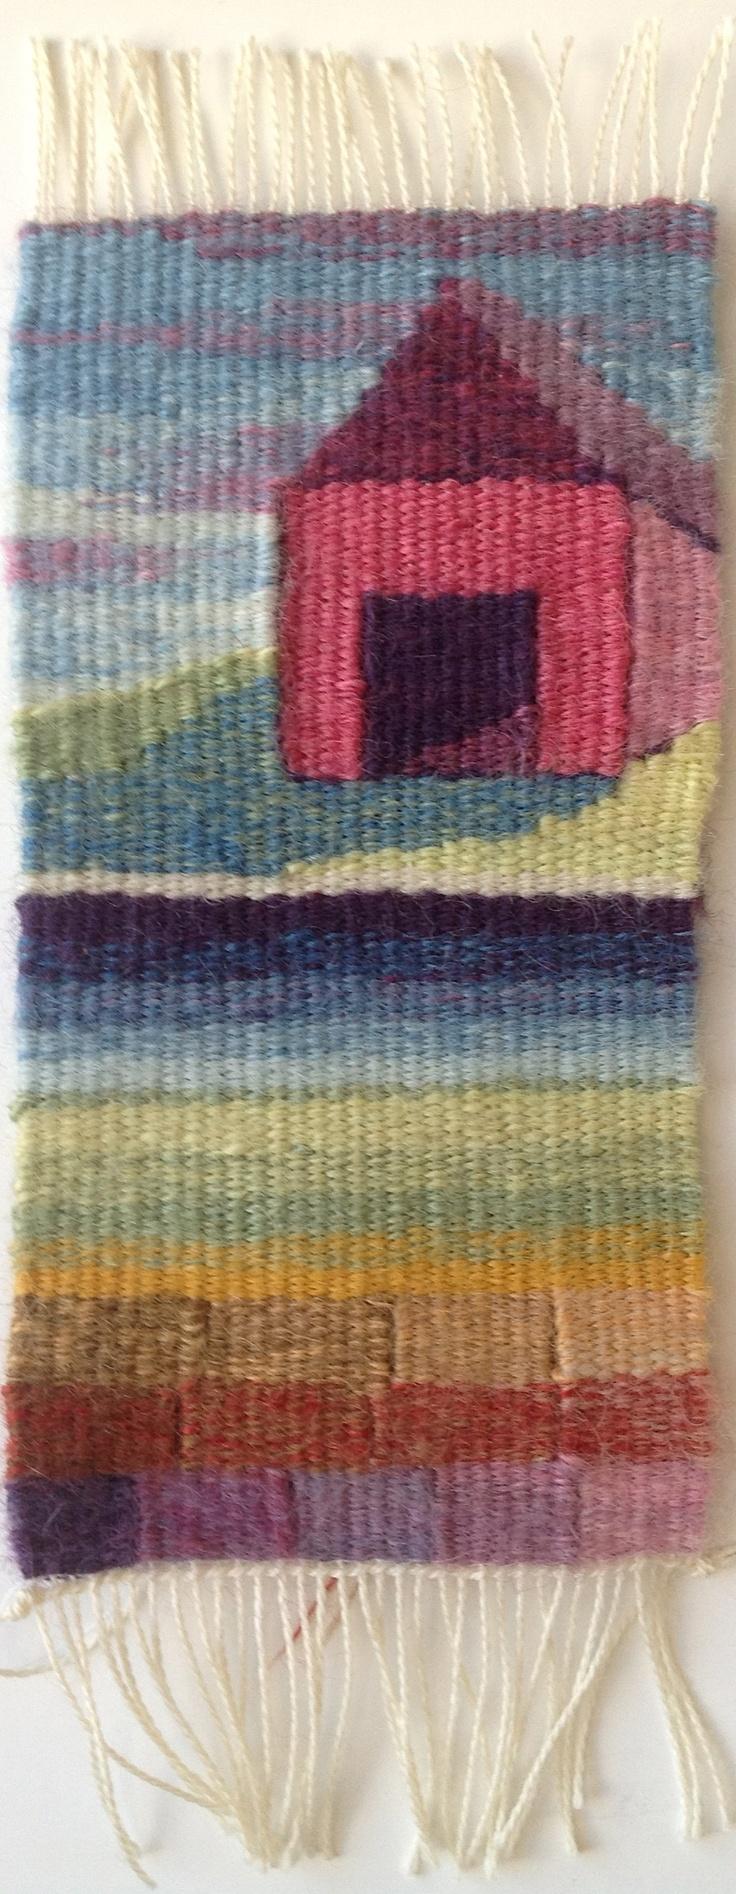 Pink Barn Weaving - TabascoCatArt.com